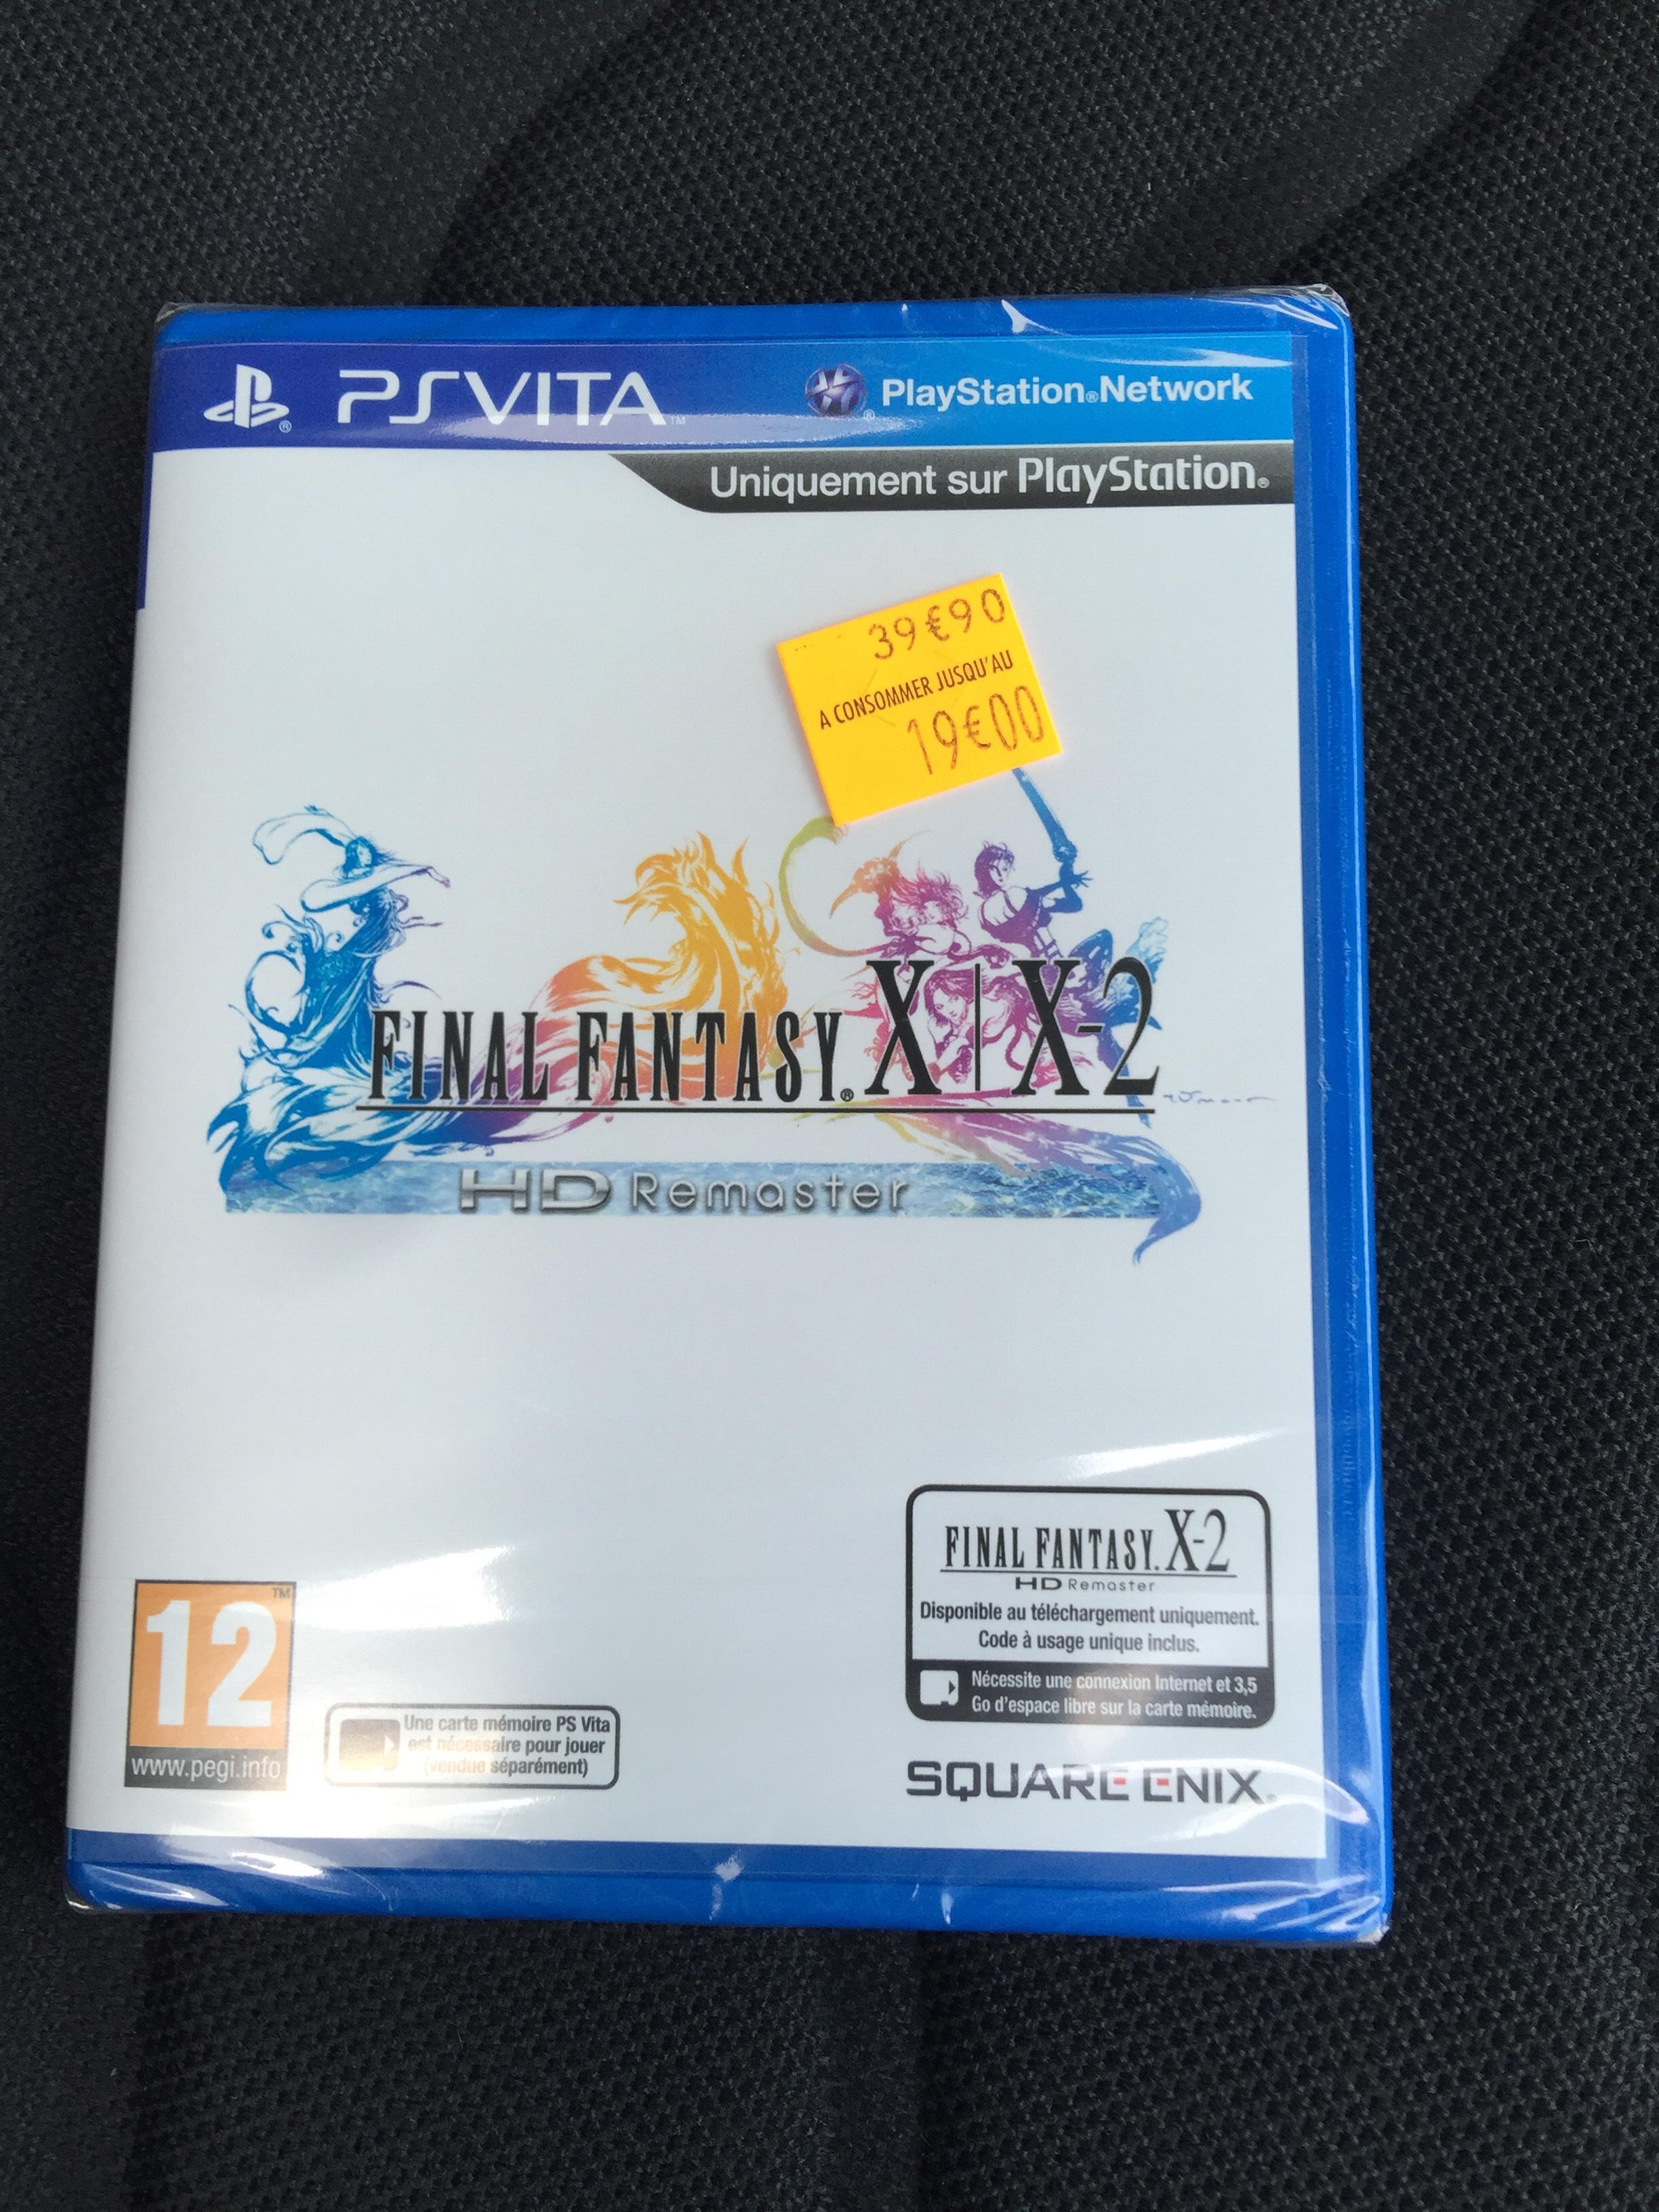 Final fantasy X-2 HD Remaster sur PSVita